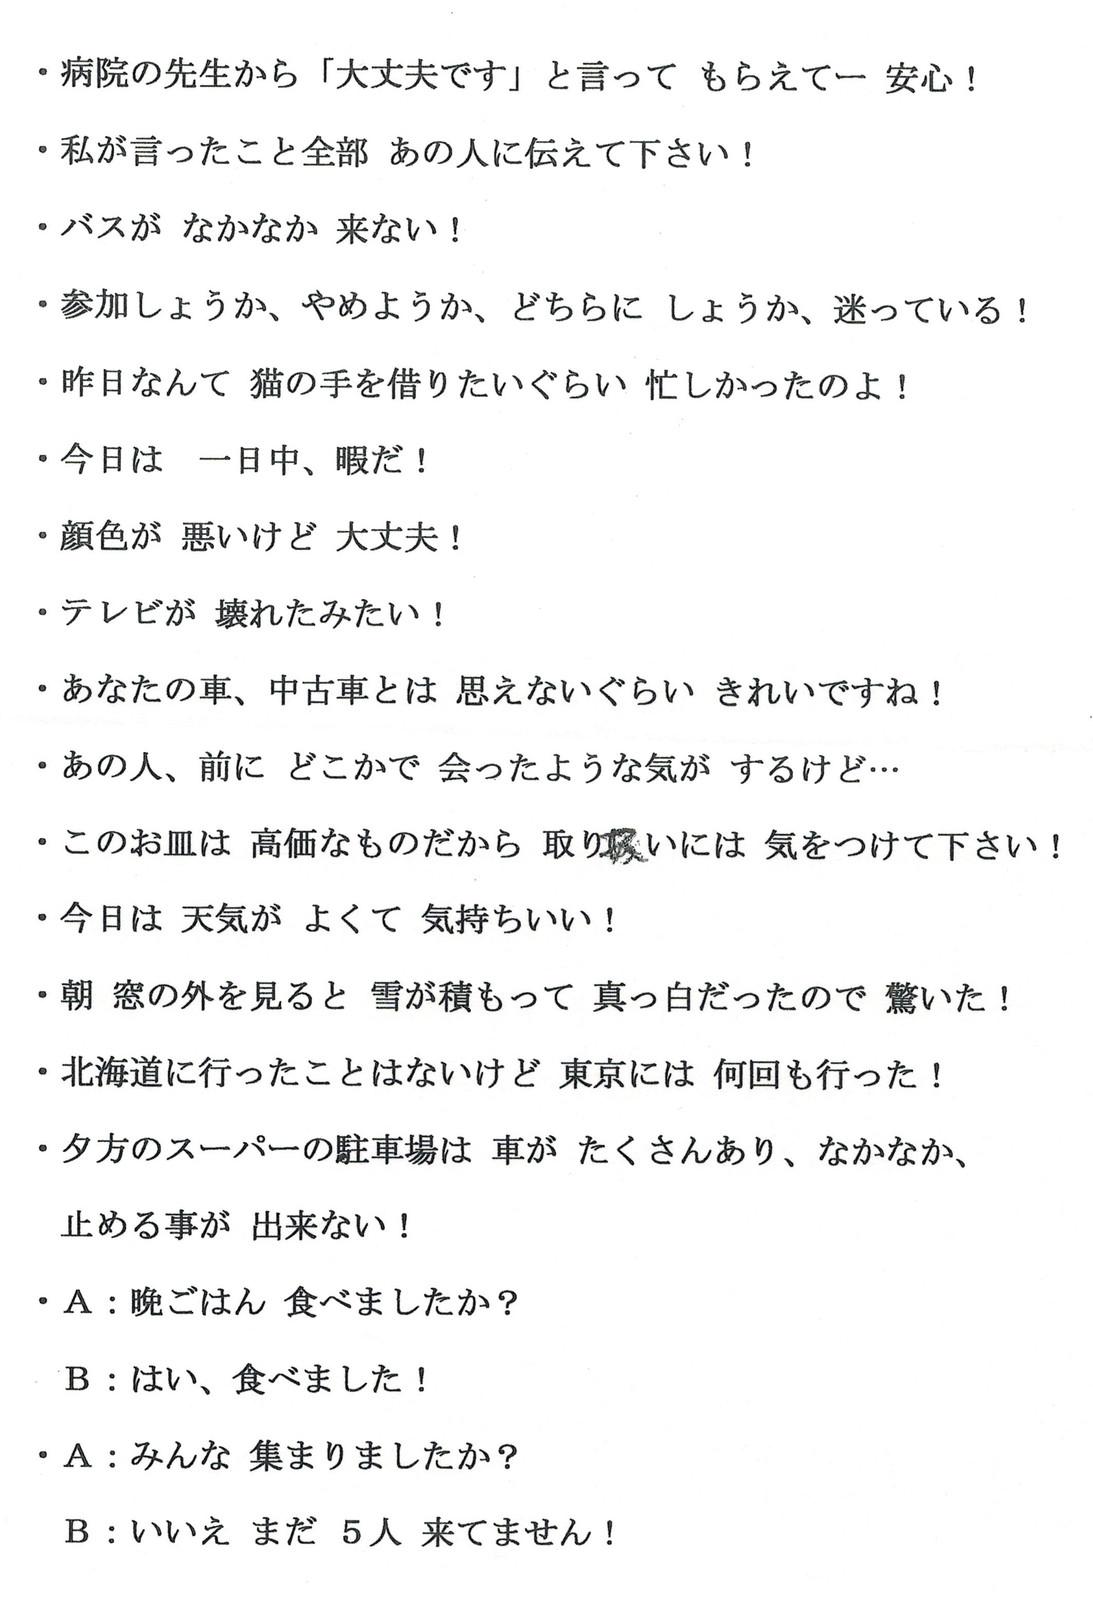 Ccf20130521_0000